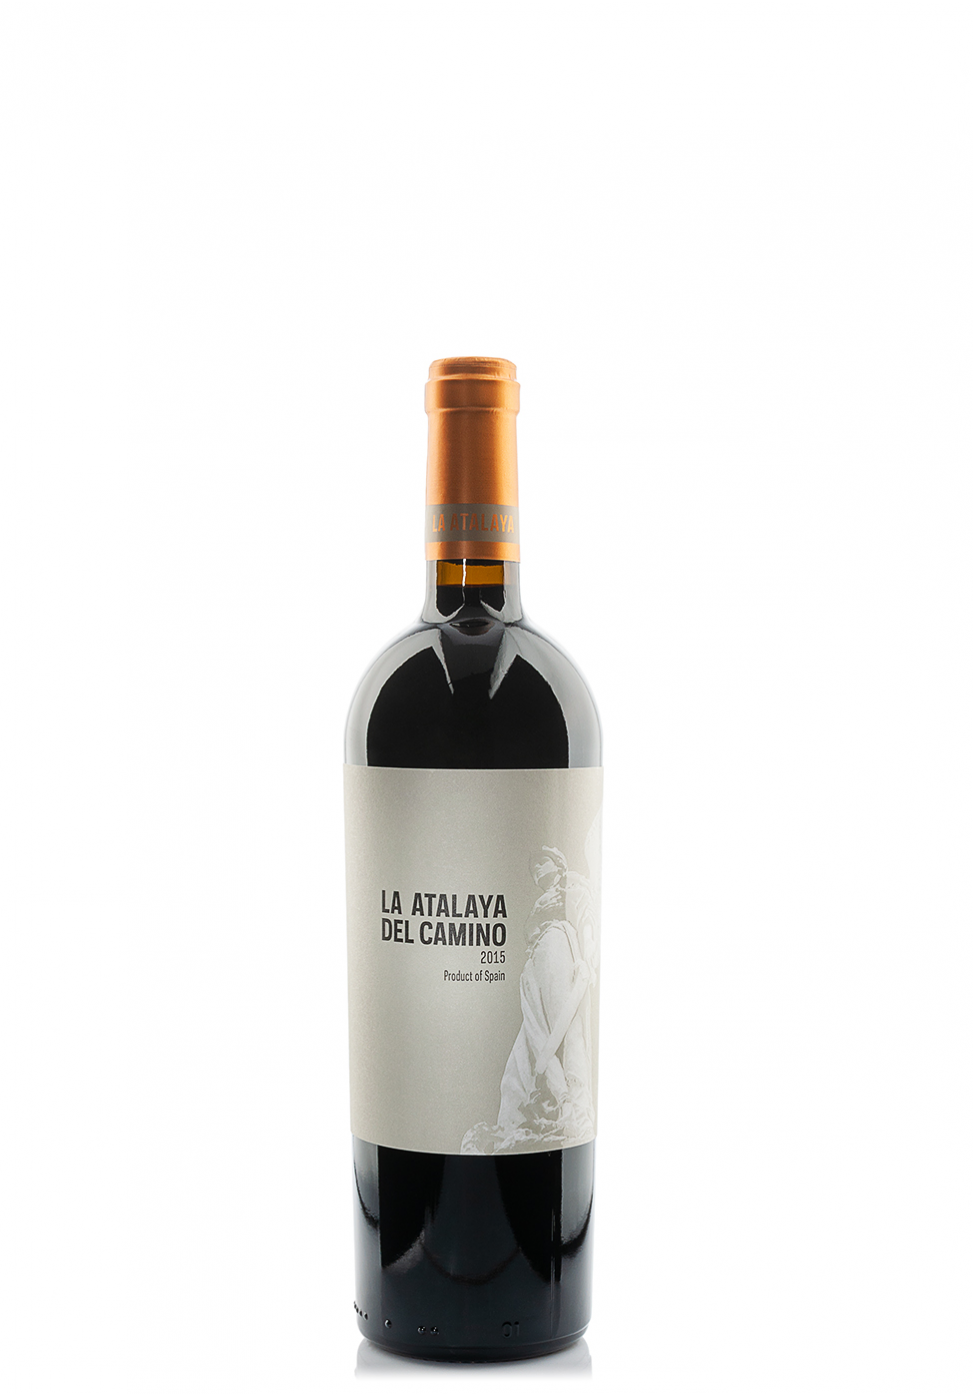 Vin Bodegas Juan Gil, La Atalaya del Camino, D.O.P. Almansa, Old Vines 2018 (0.75L)